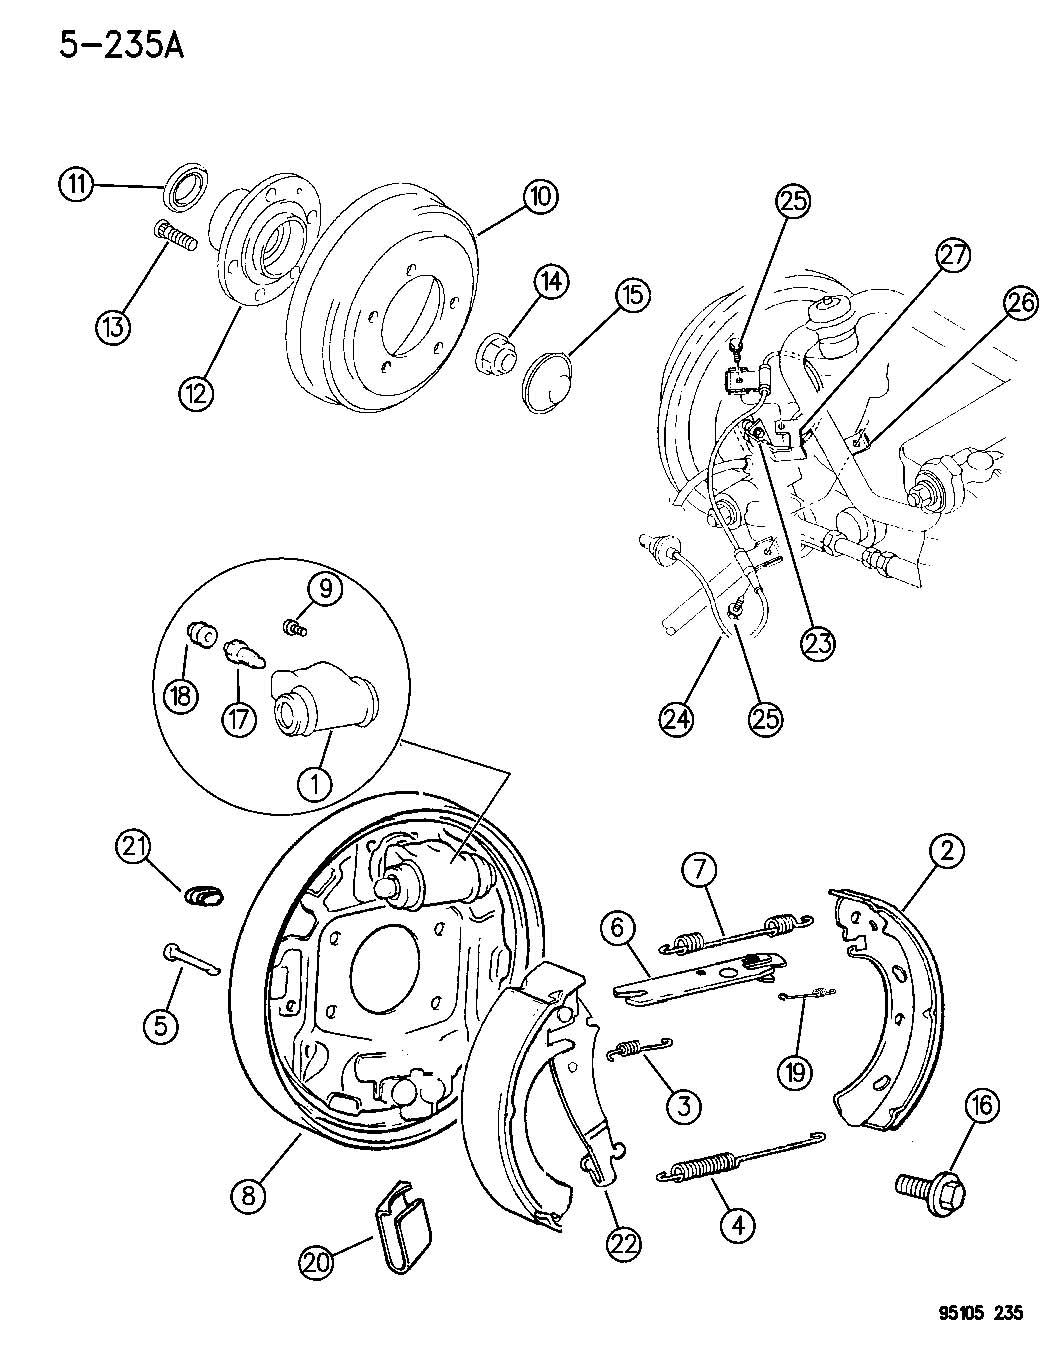 Chrysler Pt Cruiser Lock nut. Rear spindle. M20-1.50